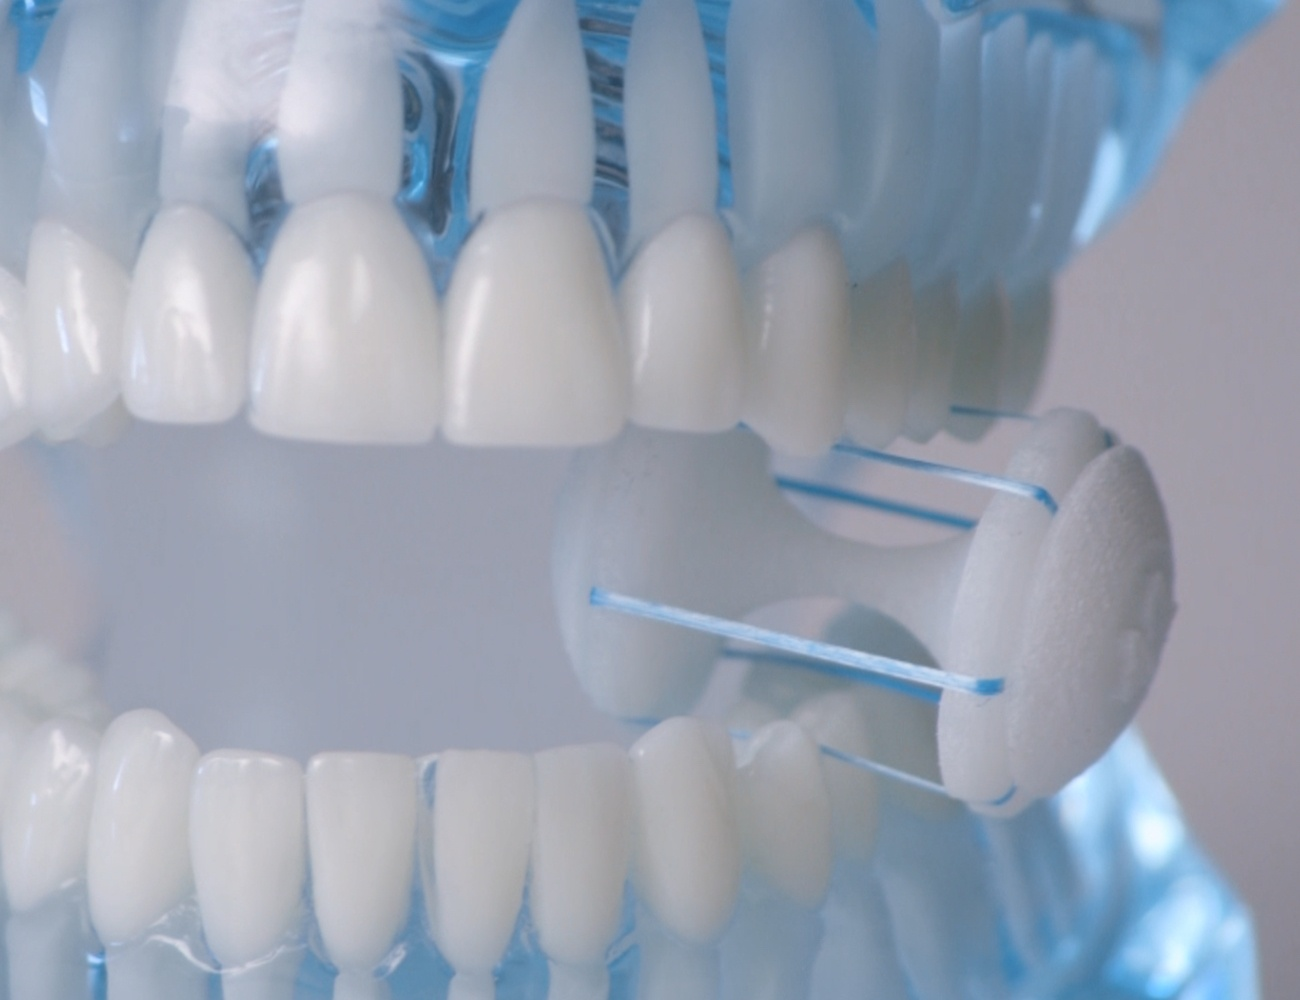 CrossFloss Hands-Free Dental Flosser